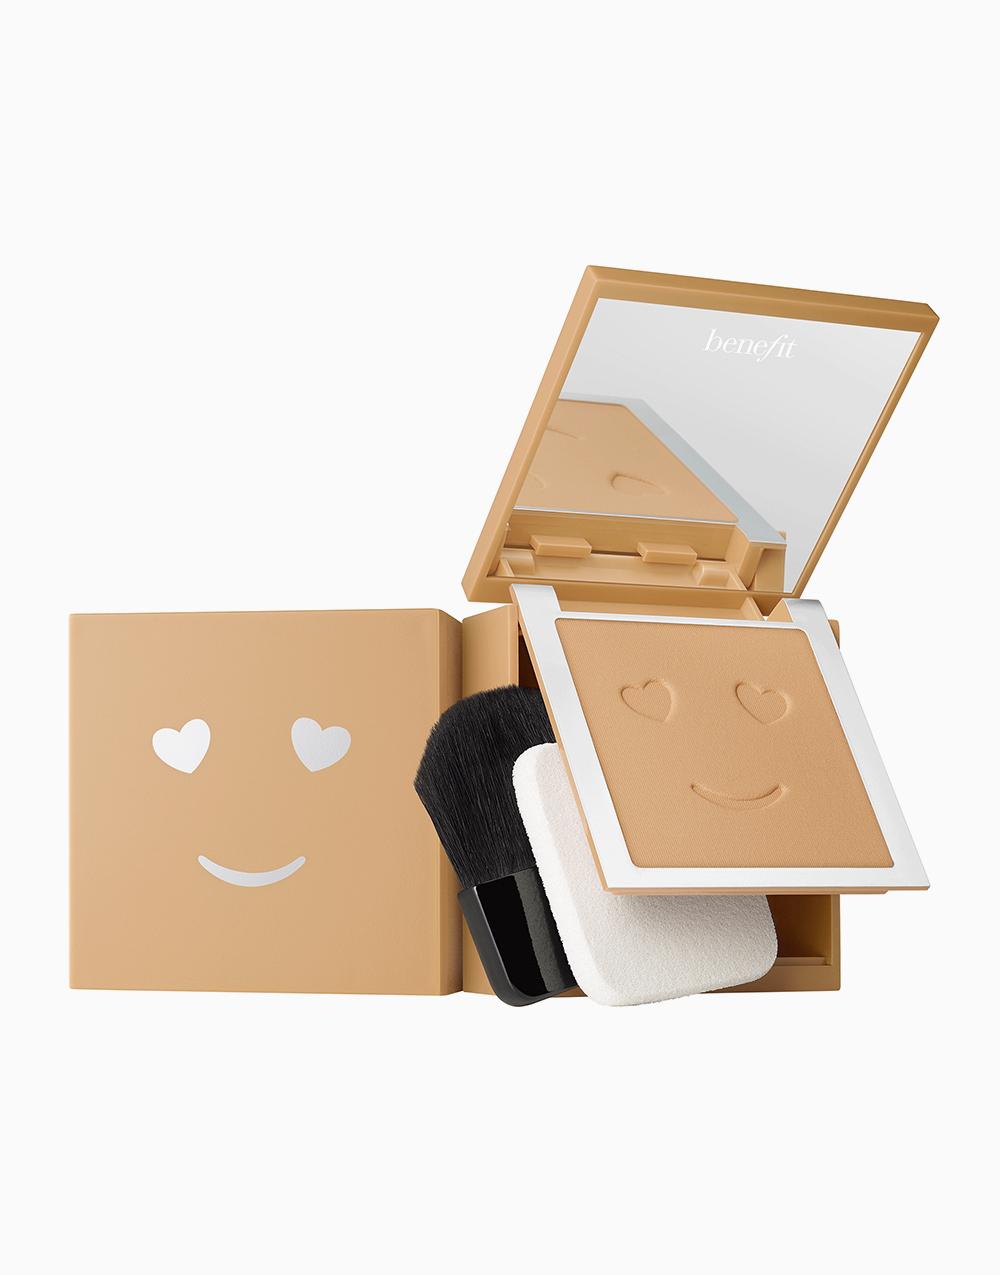 Hello Happy Velvet Powder Foundation by Benefit | Shade 06